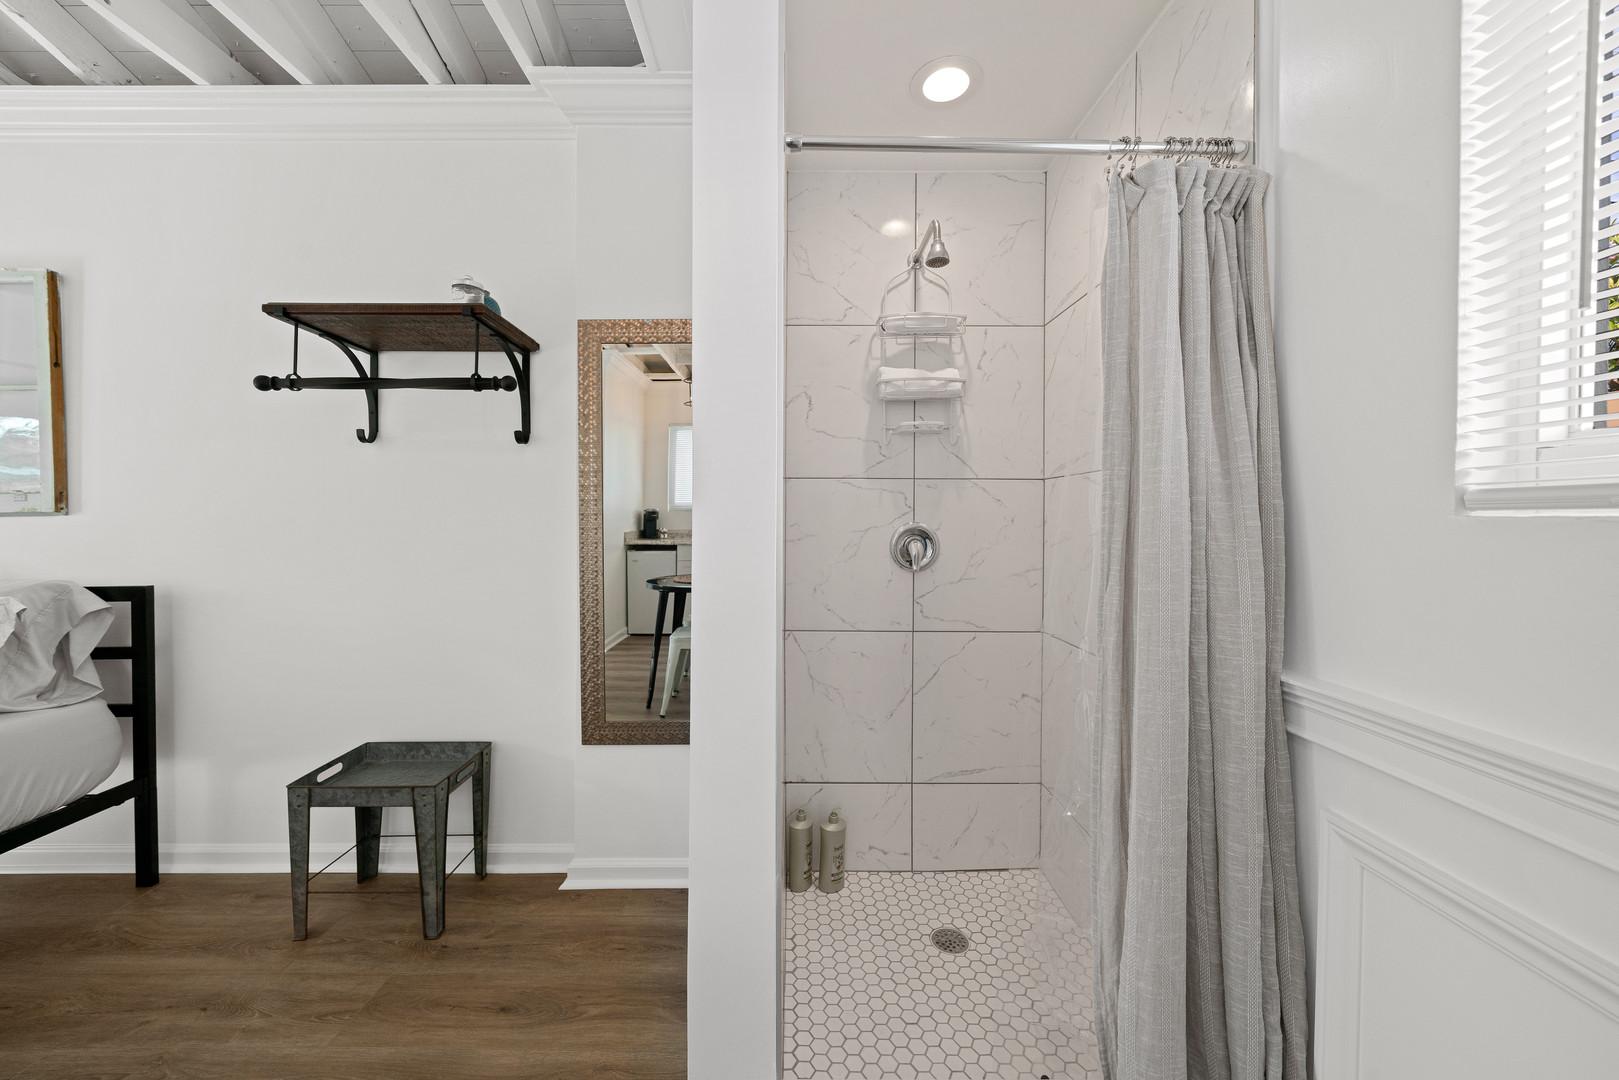 Brightly lit shower